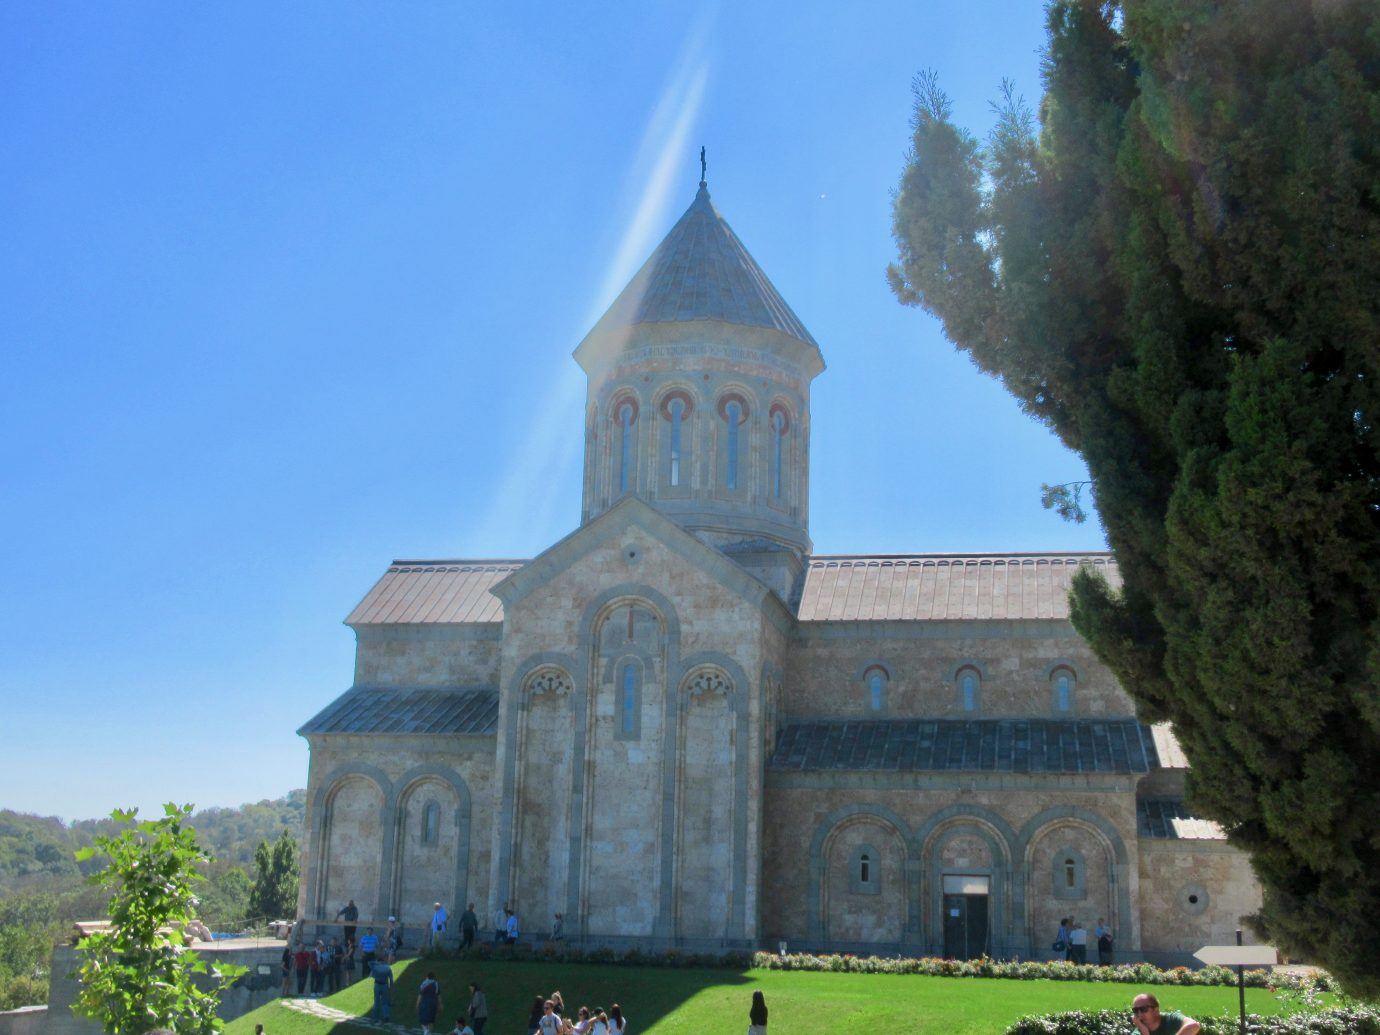 St. Ninho's Church exterior